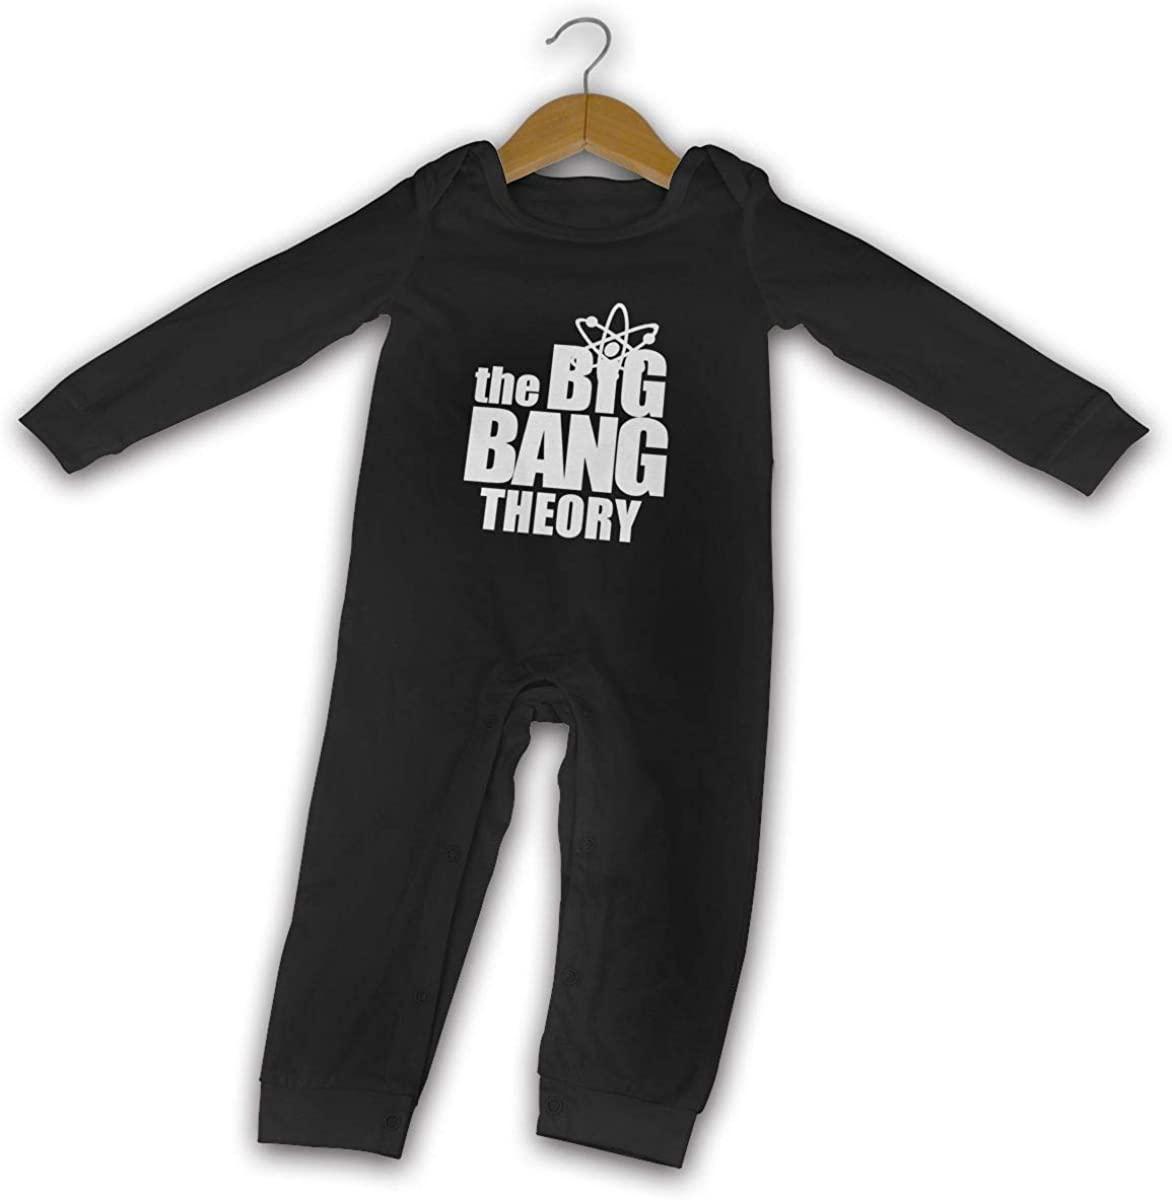 Takeyia Romper Long Sleeve The Big Bang Theory Onesies Black Baby Boy and Baby Girl Bodysuit